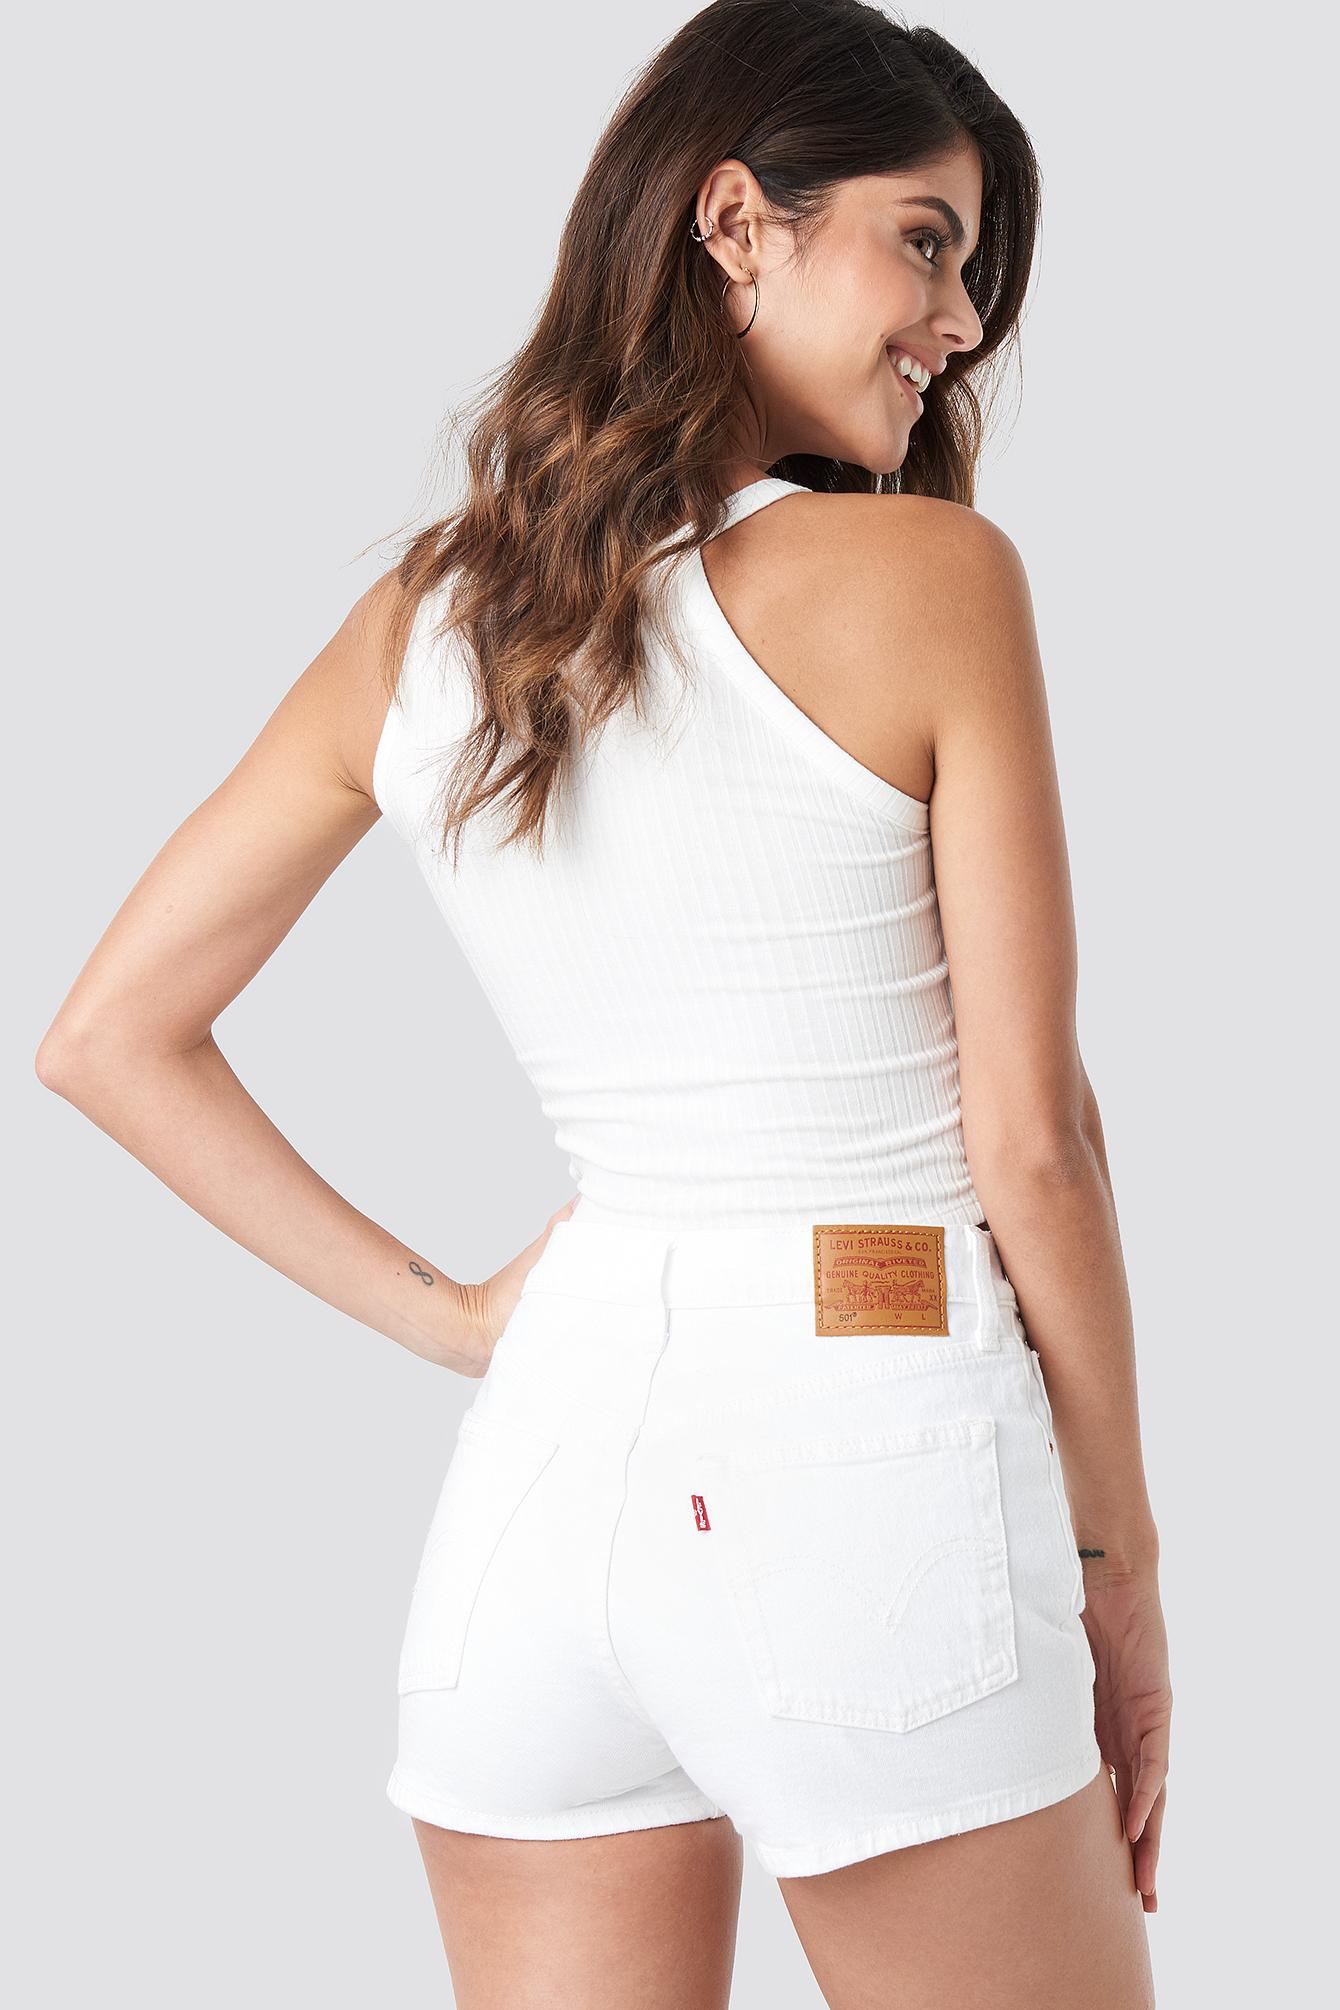 levi's -  501 High Rise Shorts - White